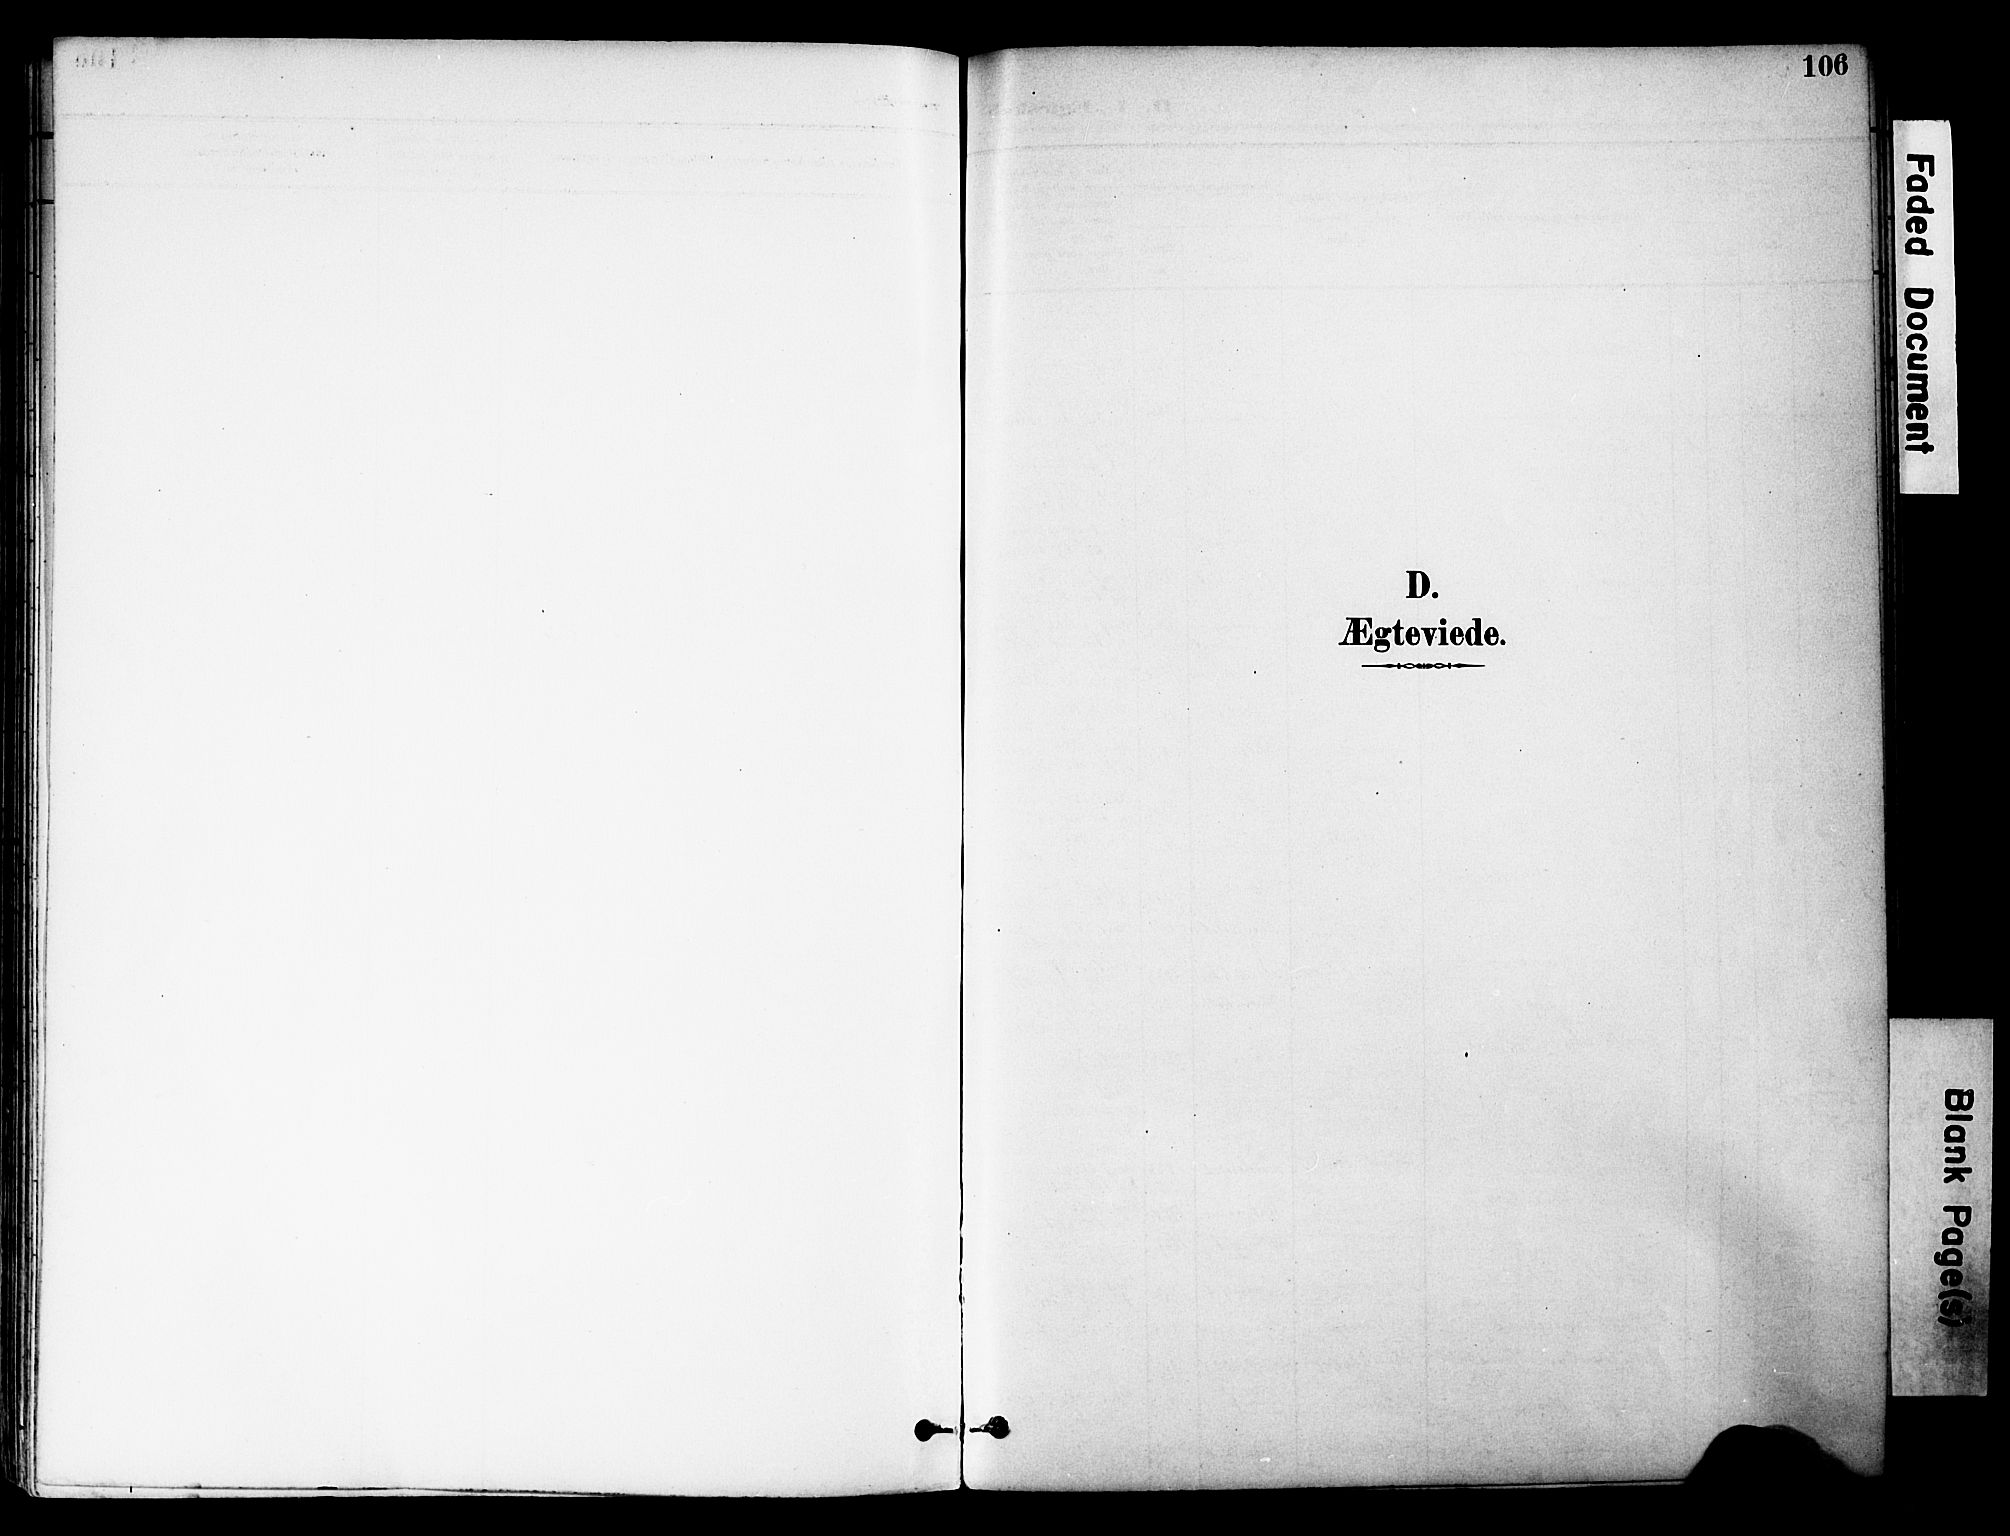 SAH, Brandbu prestekontor, Klokkerbok nr. 6, 1893-1902, s. 106